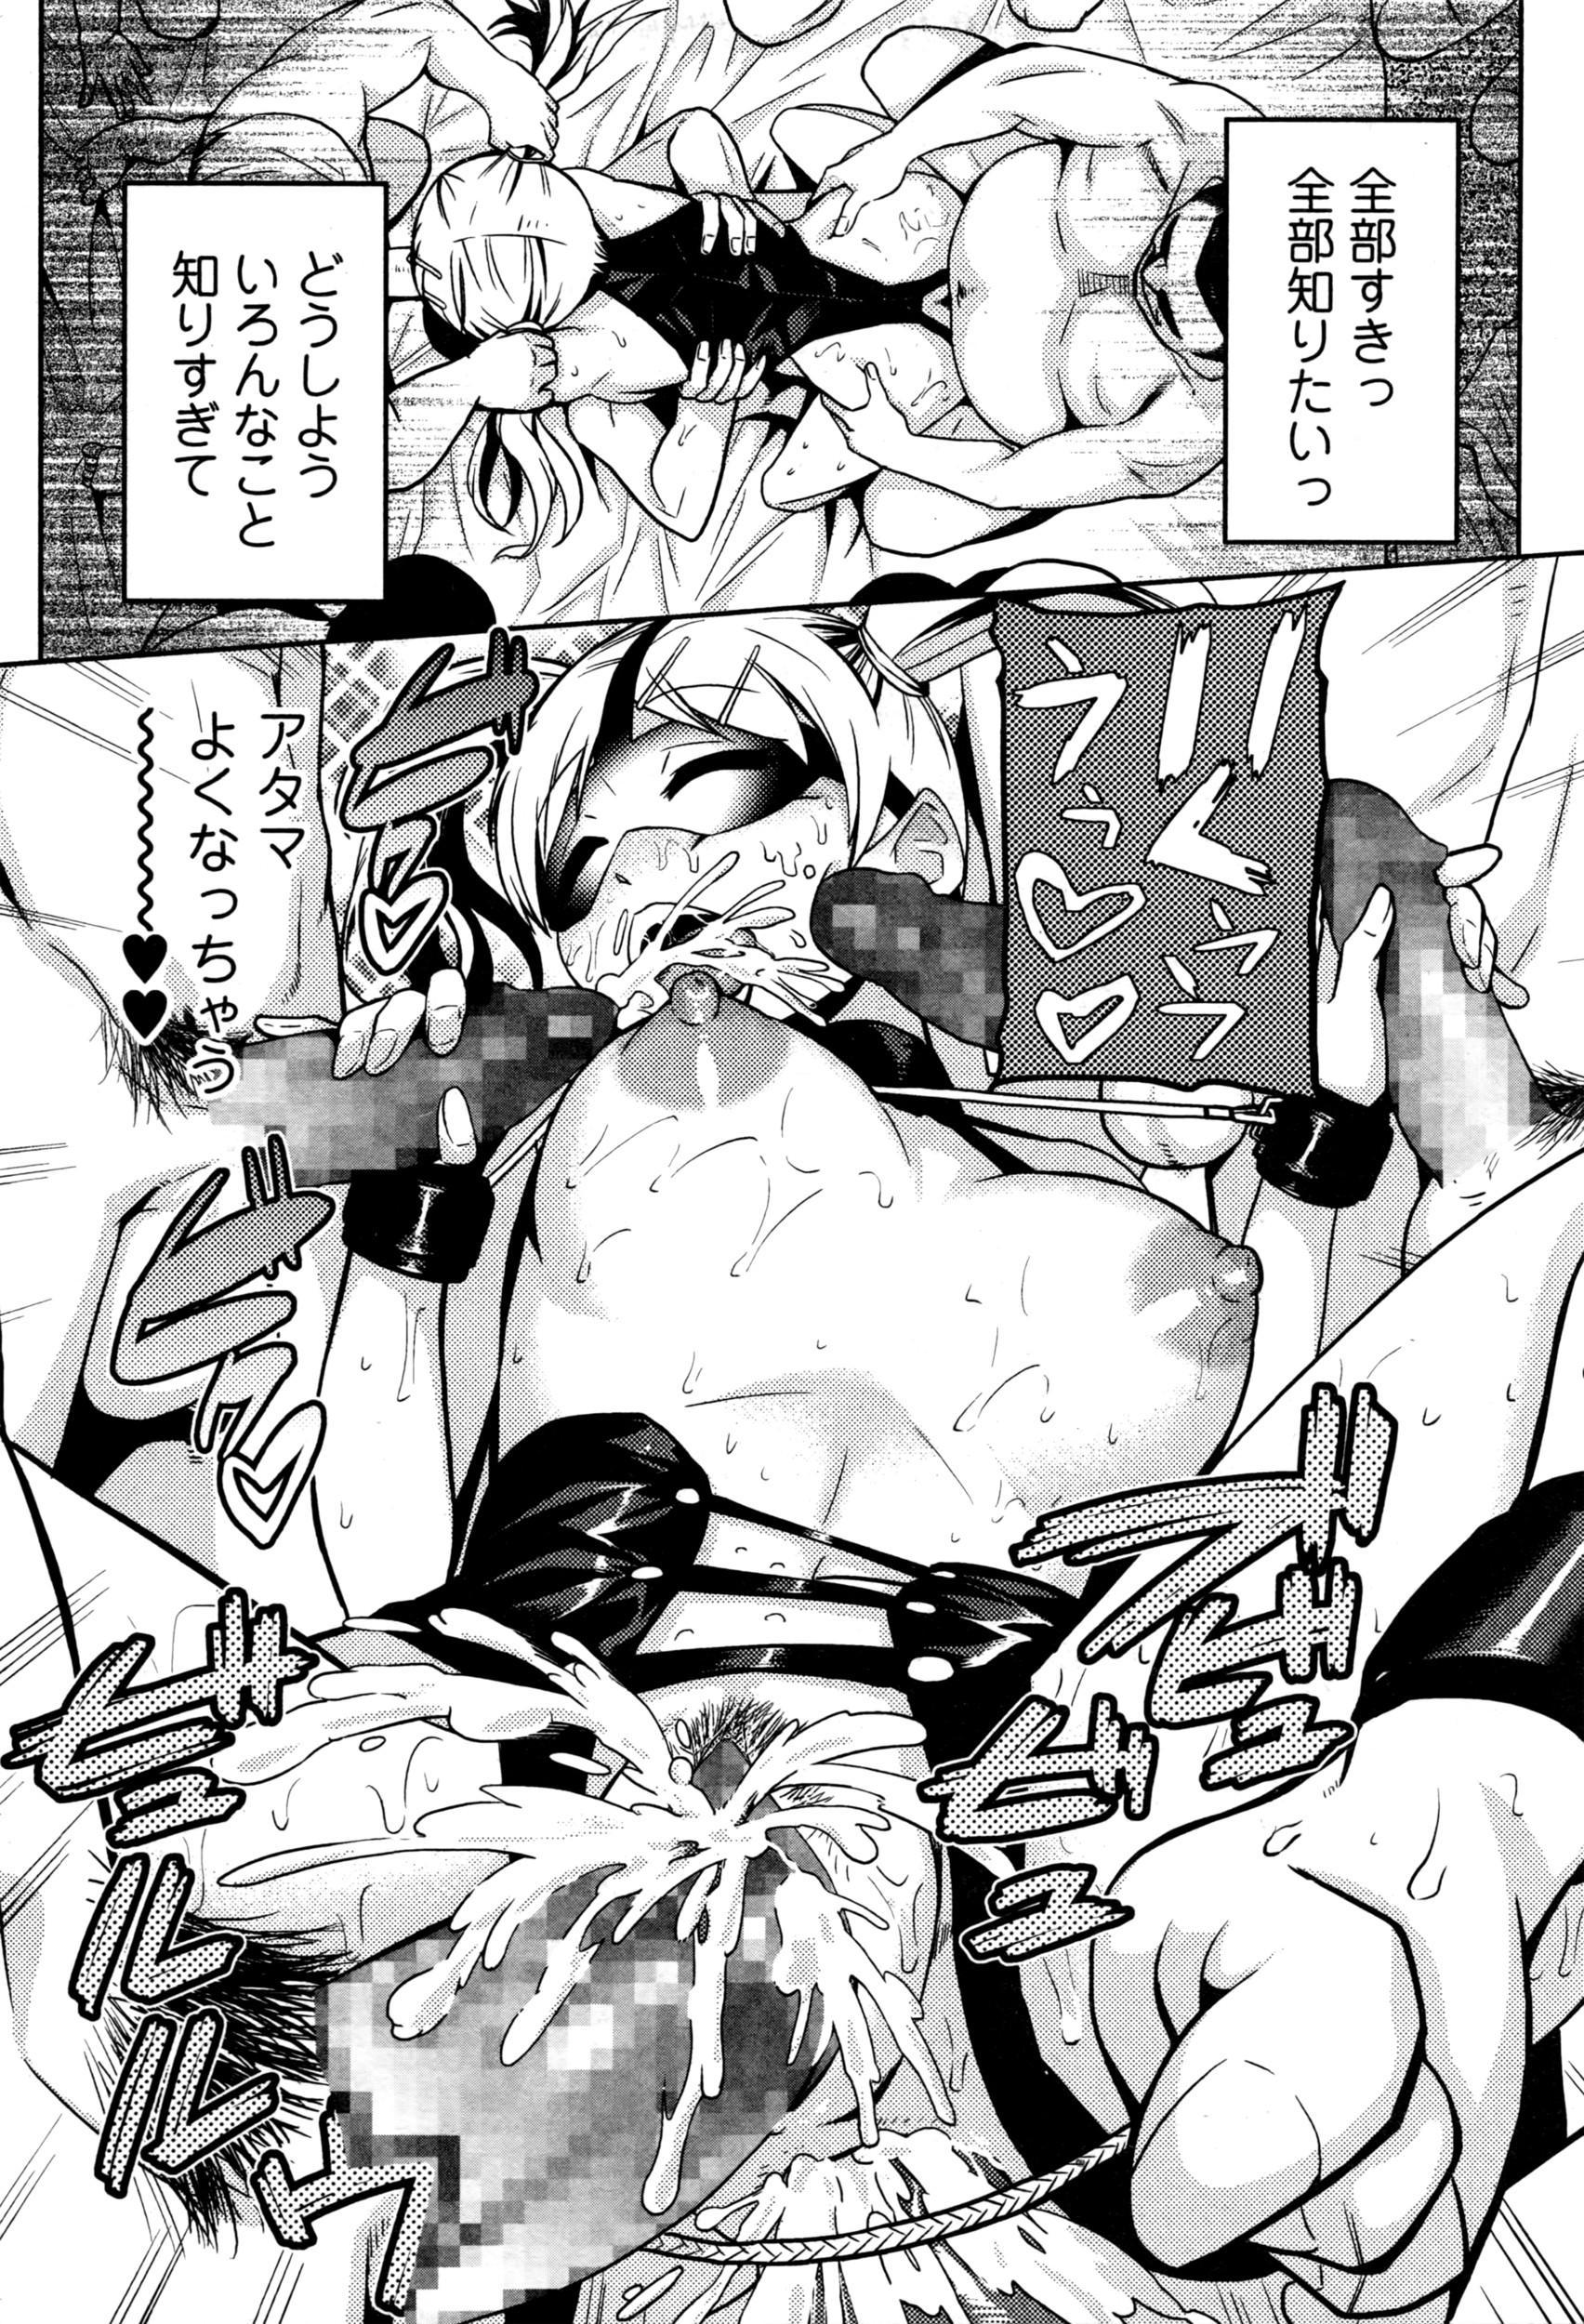 Comic JSCK Vol.3 2016-03 153